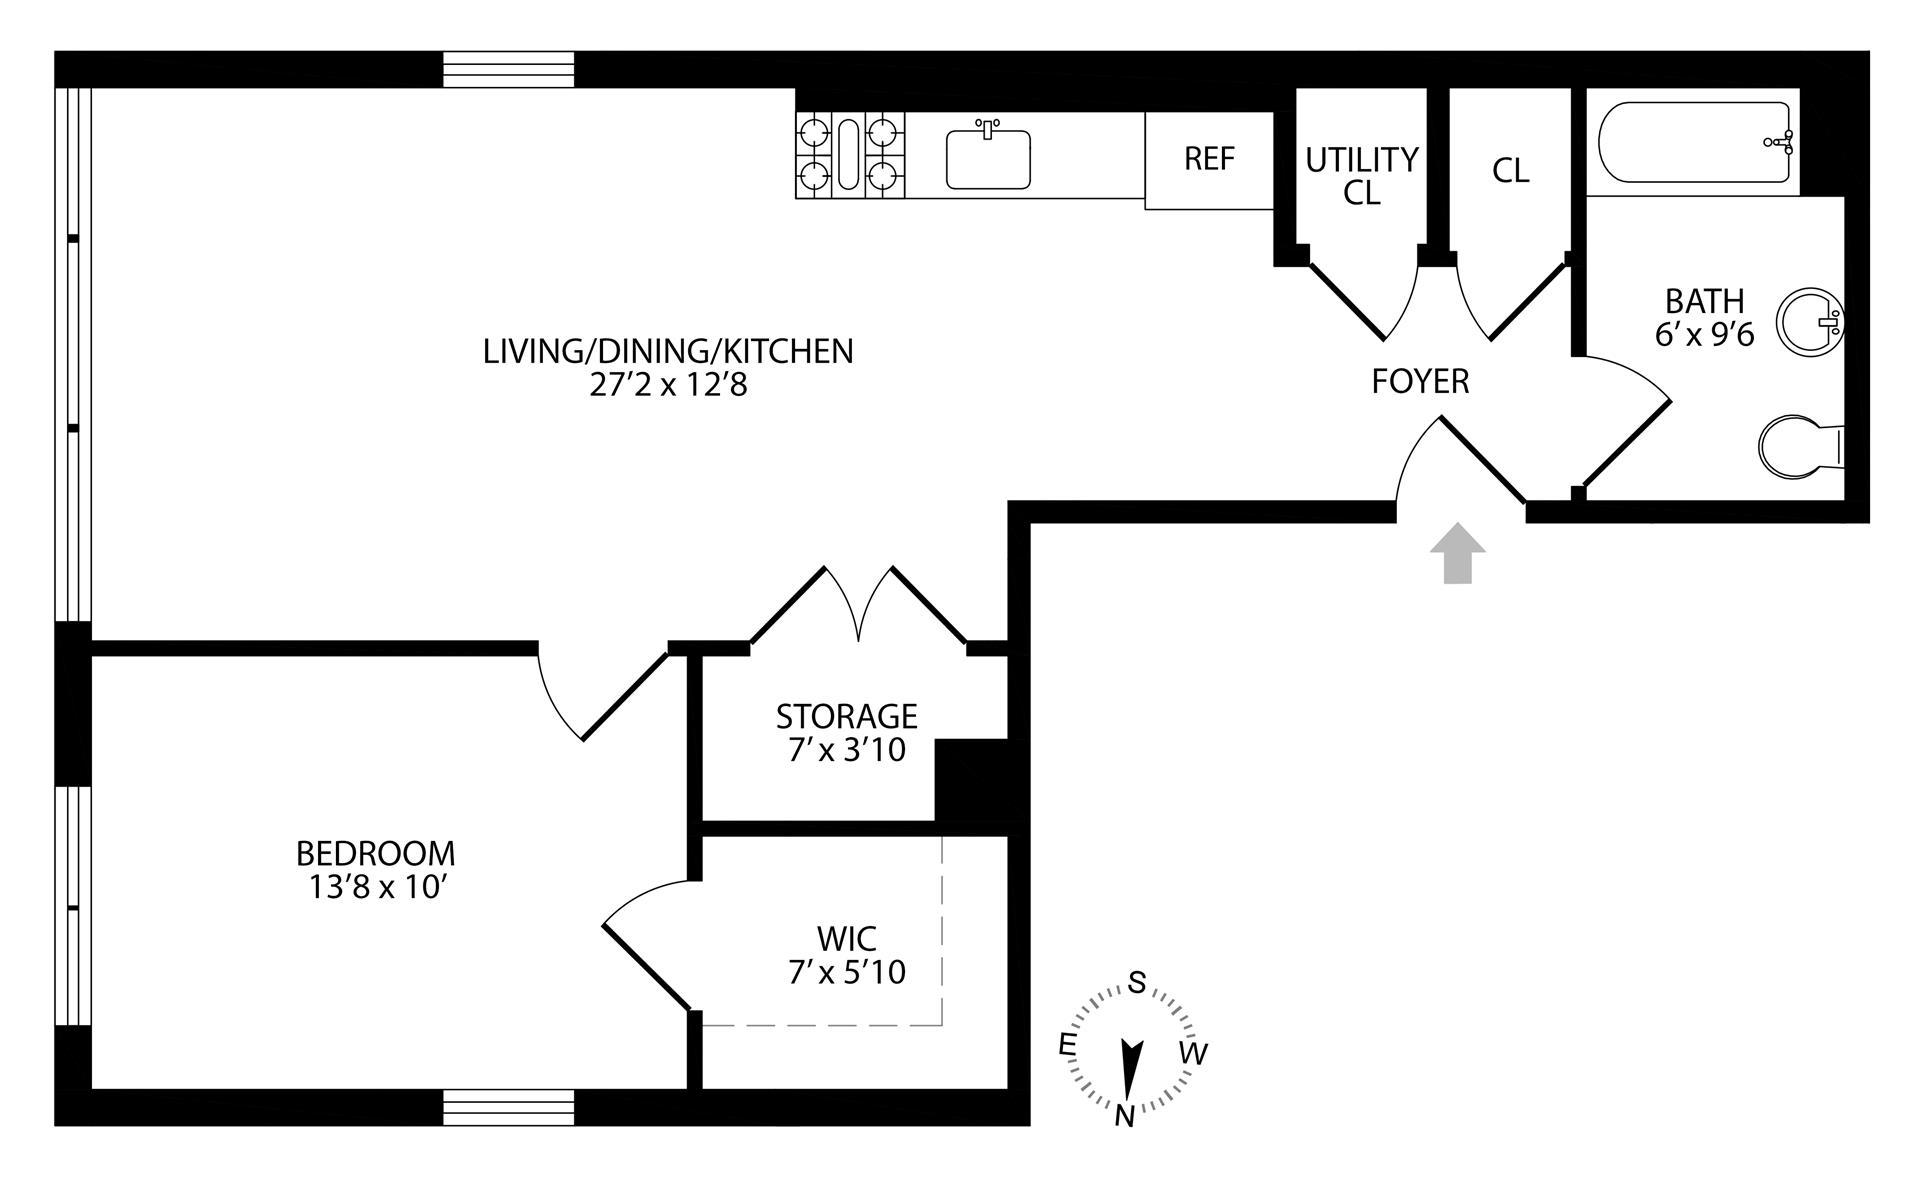 Floor plan of 977 Manhattan Avenue - Greenpoint, New York